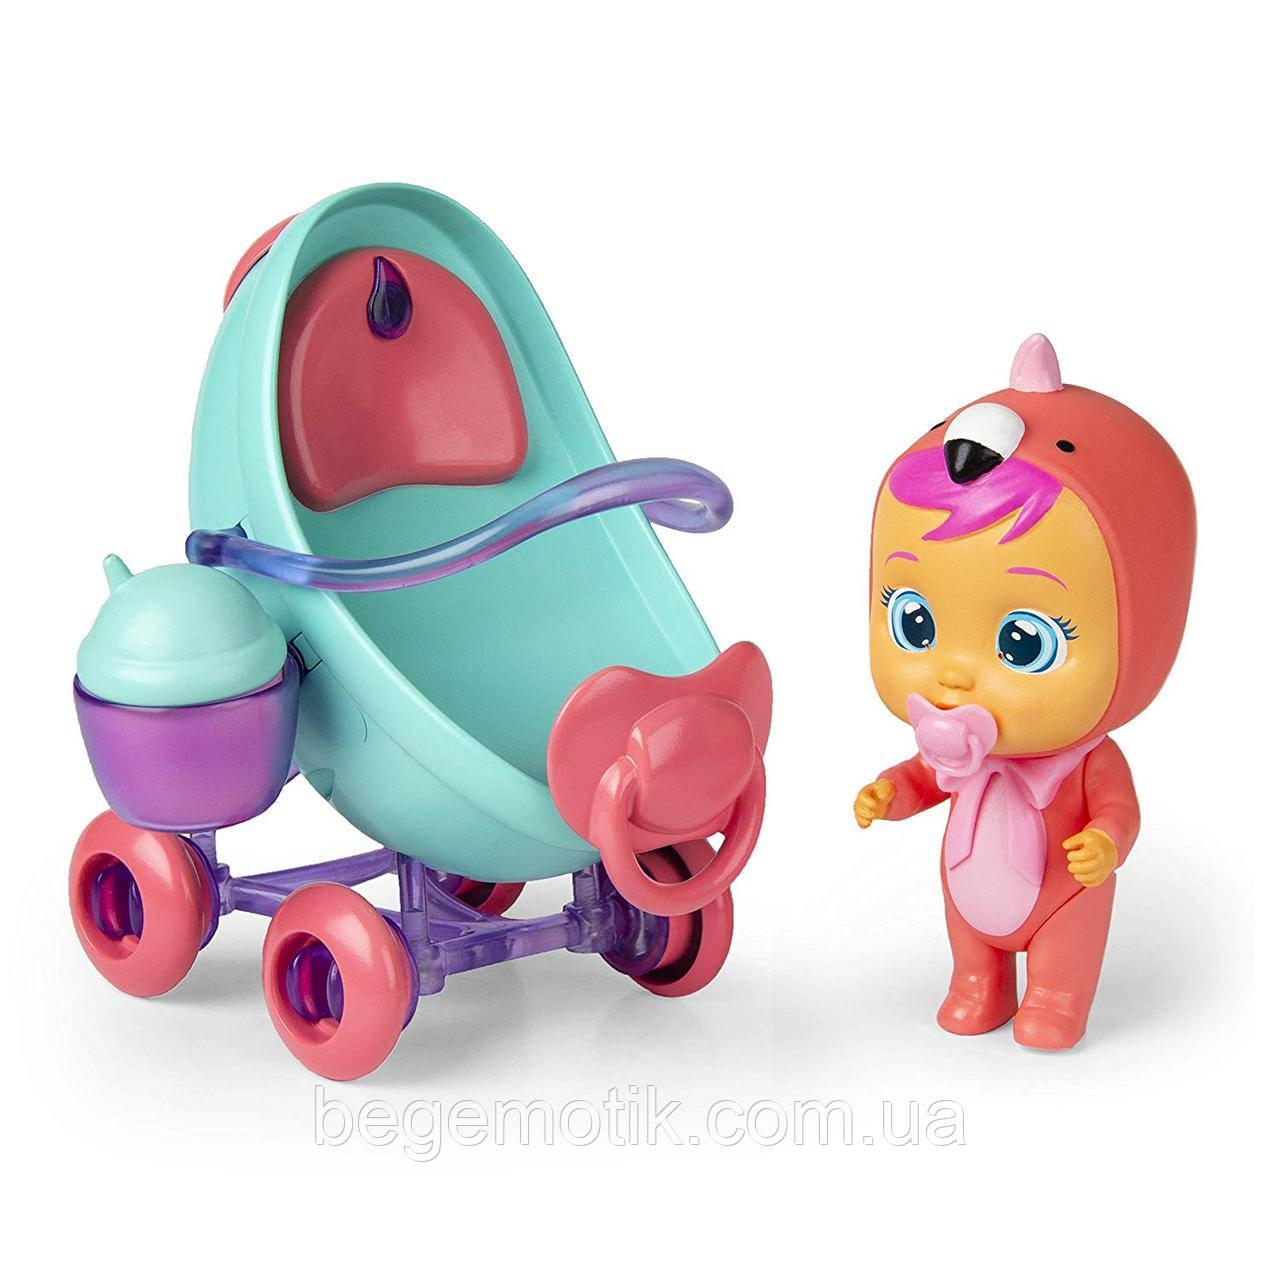 Cry Babies Игровой набор Край беби пупс Фламинго с коляской Cry Babies MagicTears Fancy's Vehicle